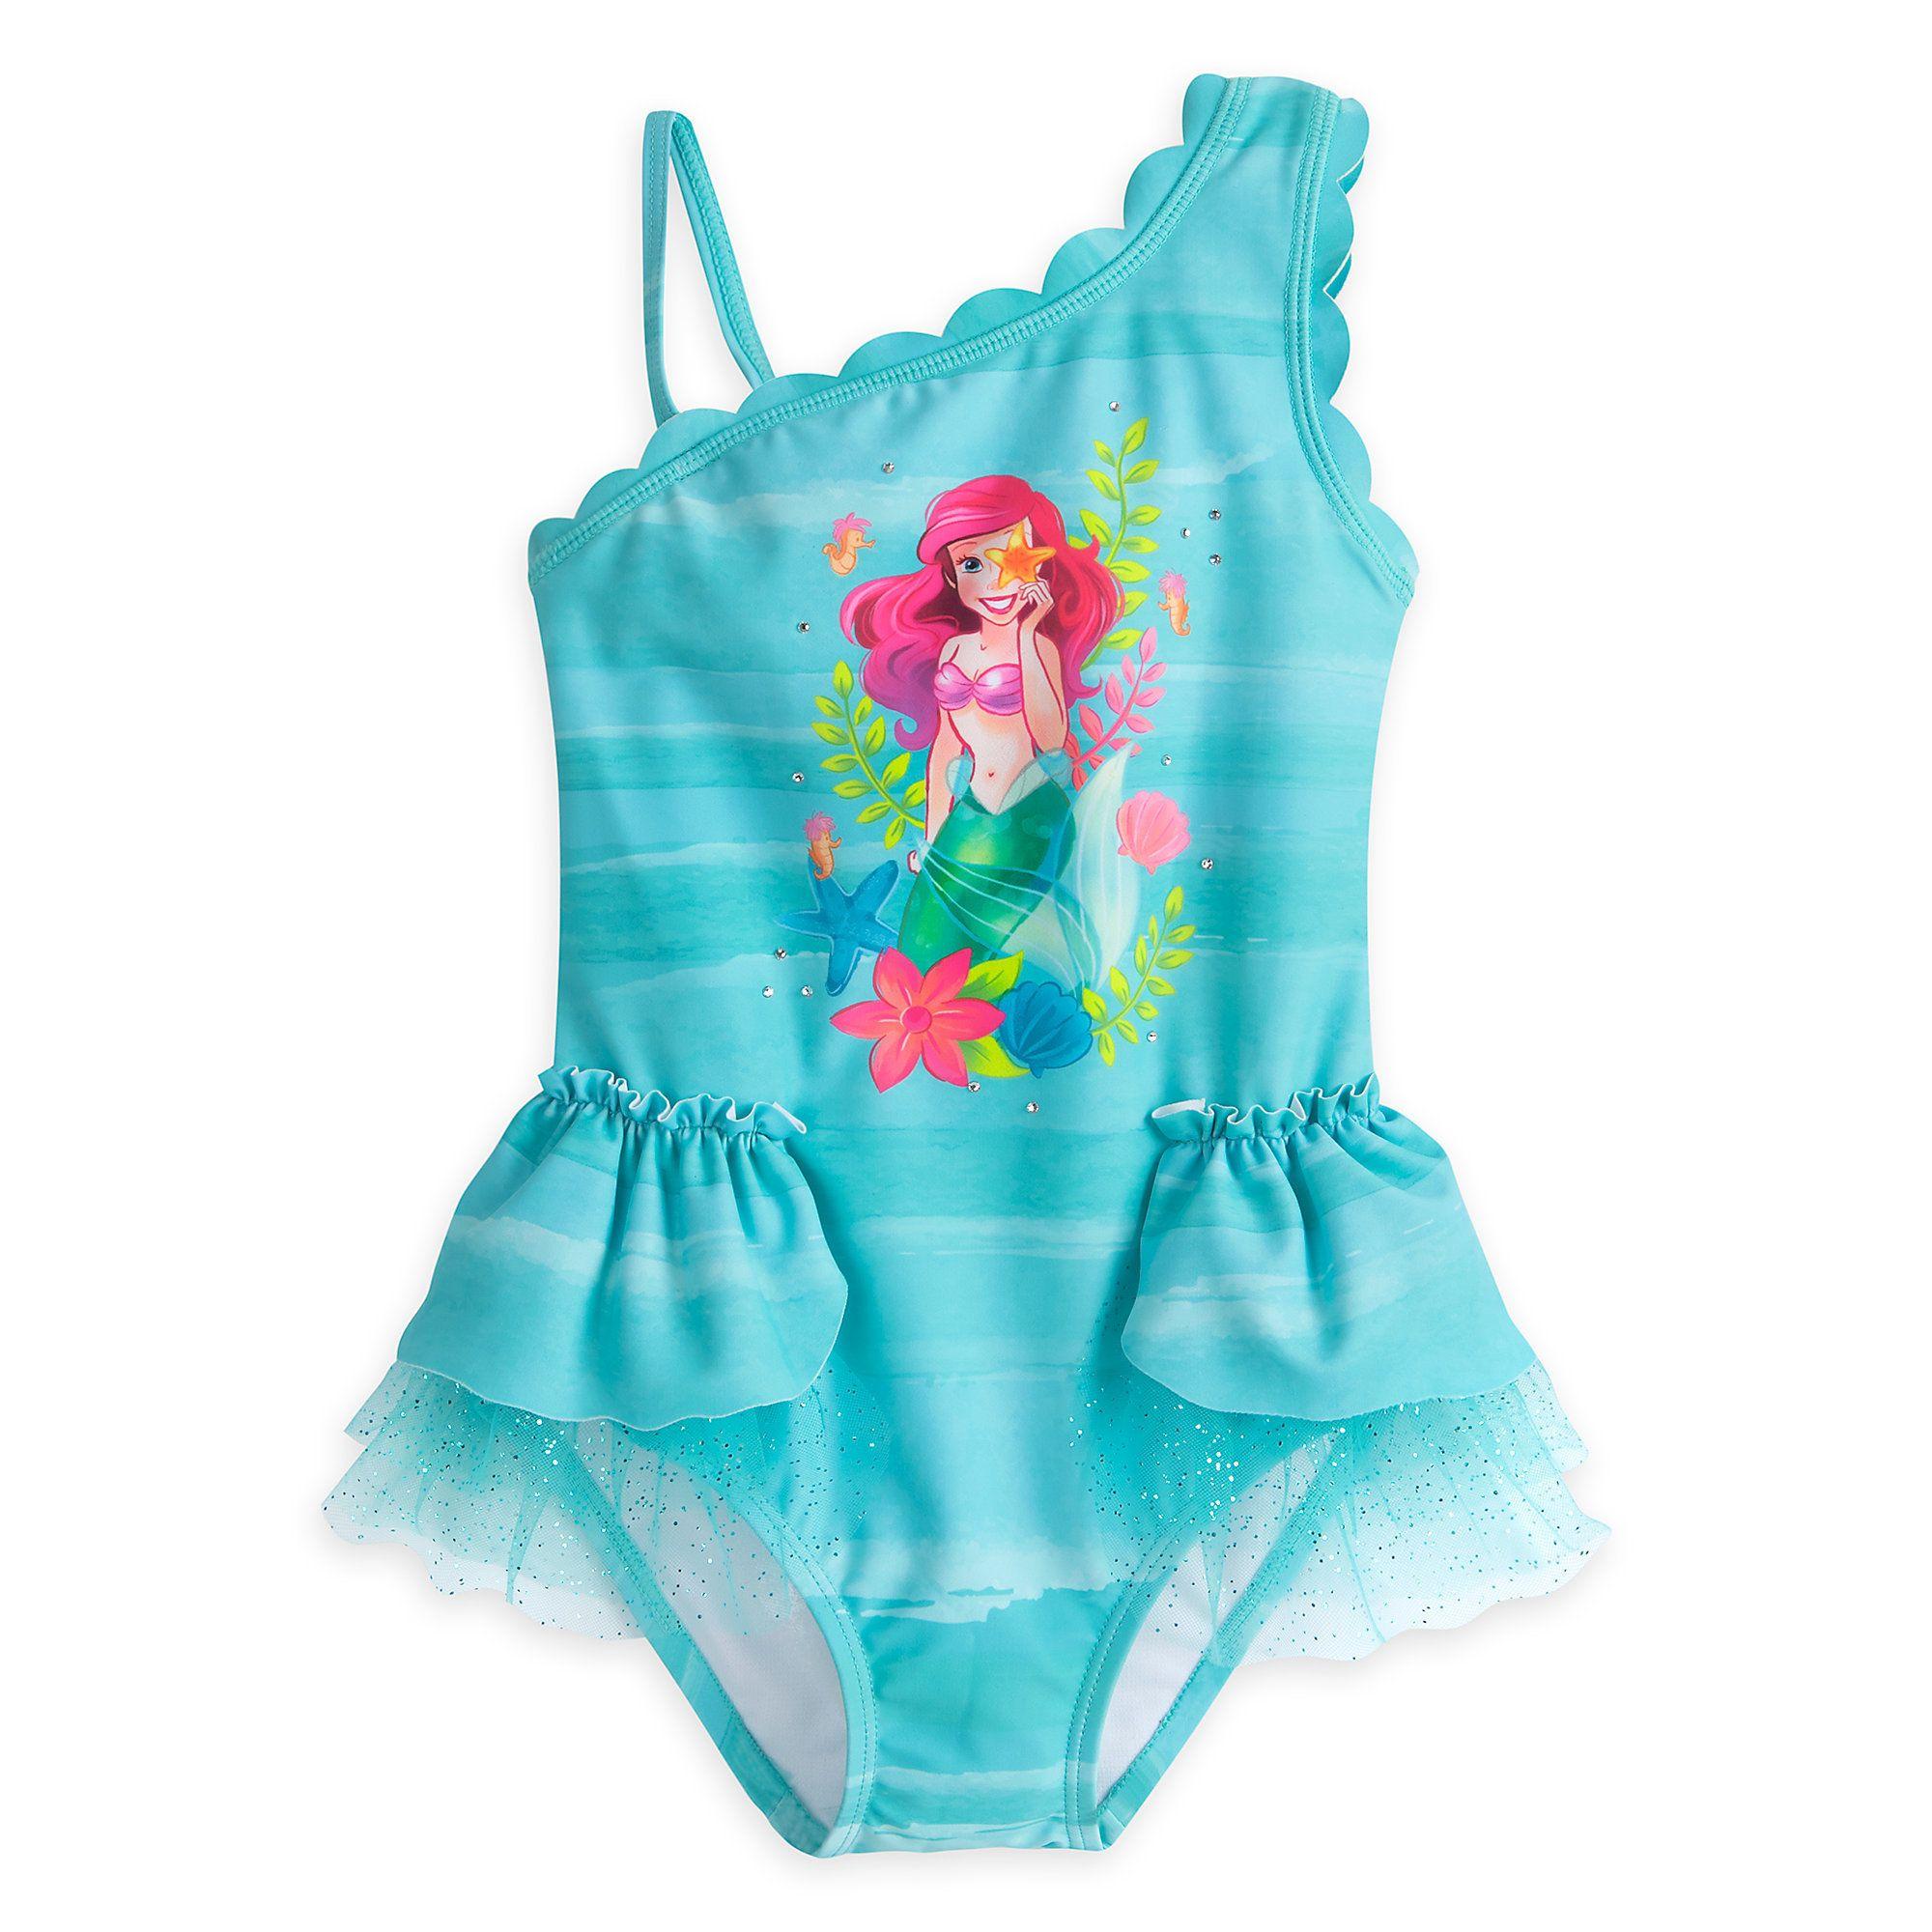 12c7bbf5b0 Ariel Deluxe Swimsuit for Girls | DISNEY | Pinterest | Swimsuits ...